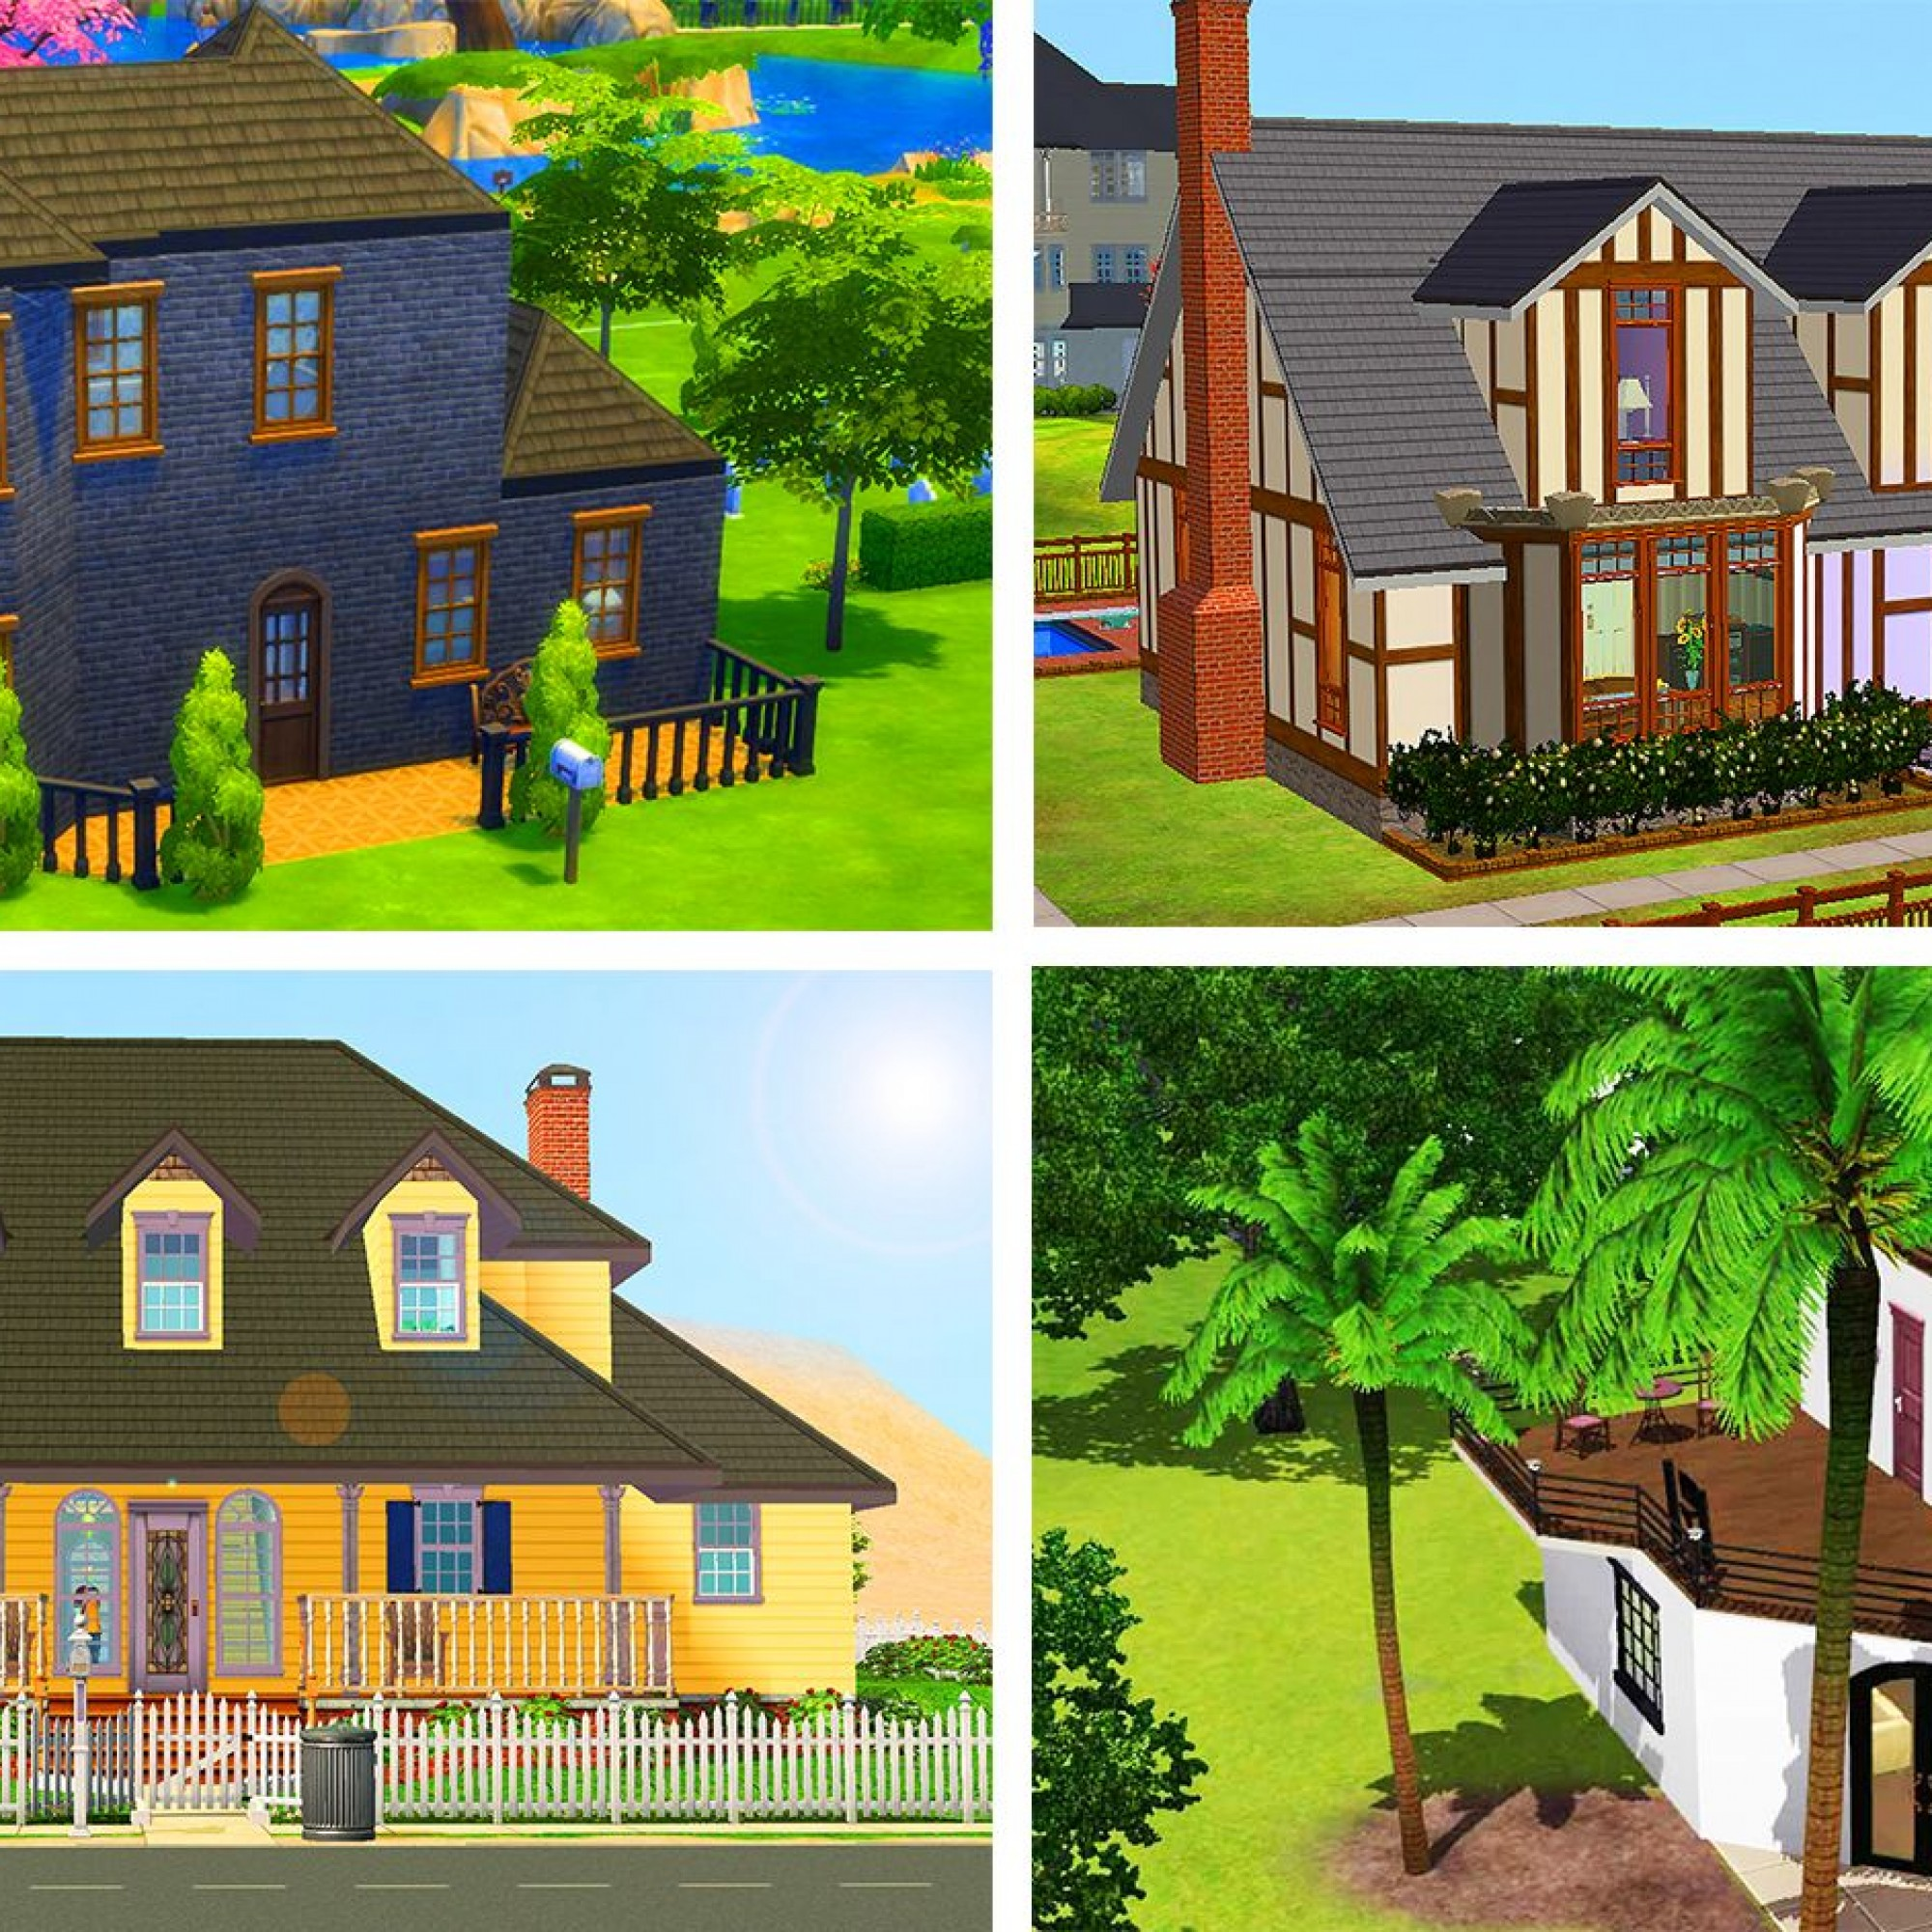 20 Jahre Sims Sechs legendäre Gebäude neu illustriert   Baublatt